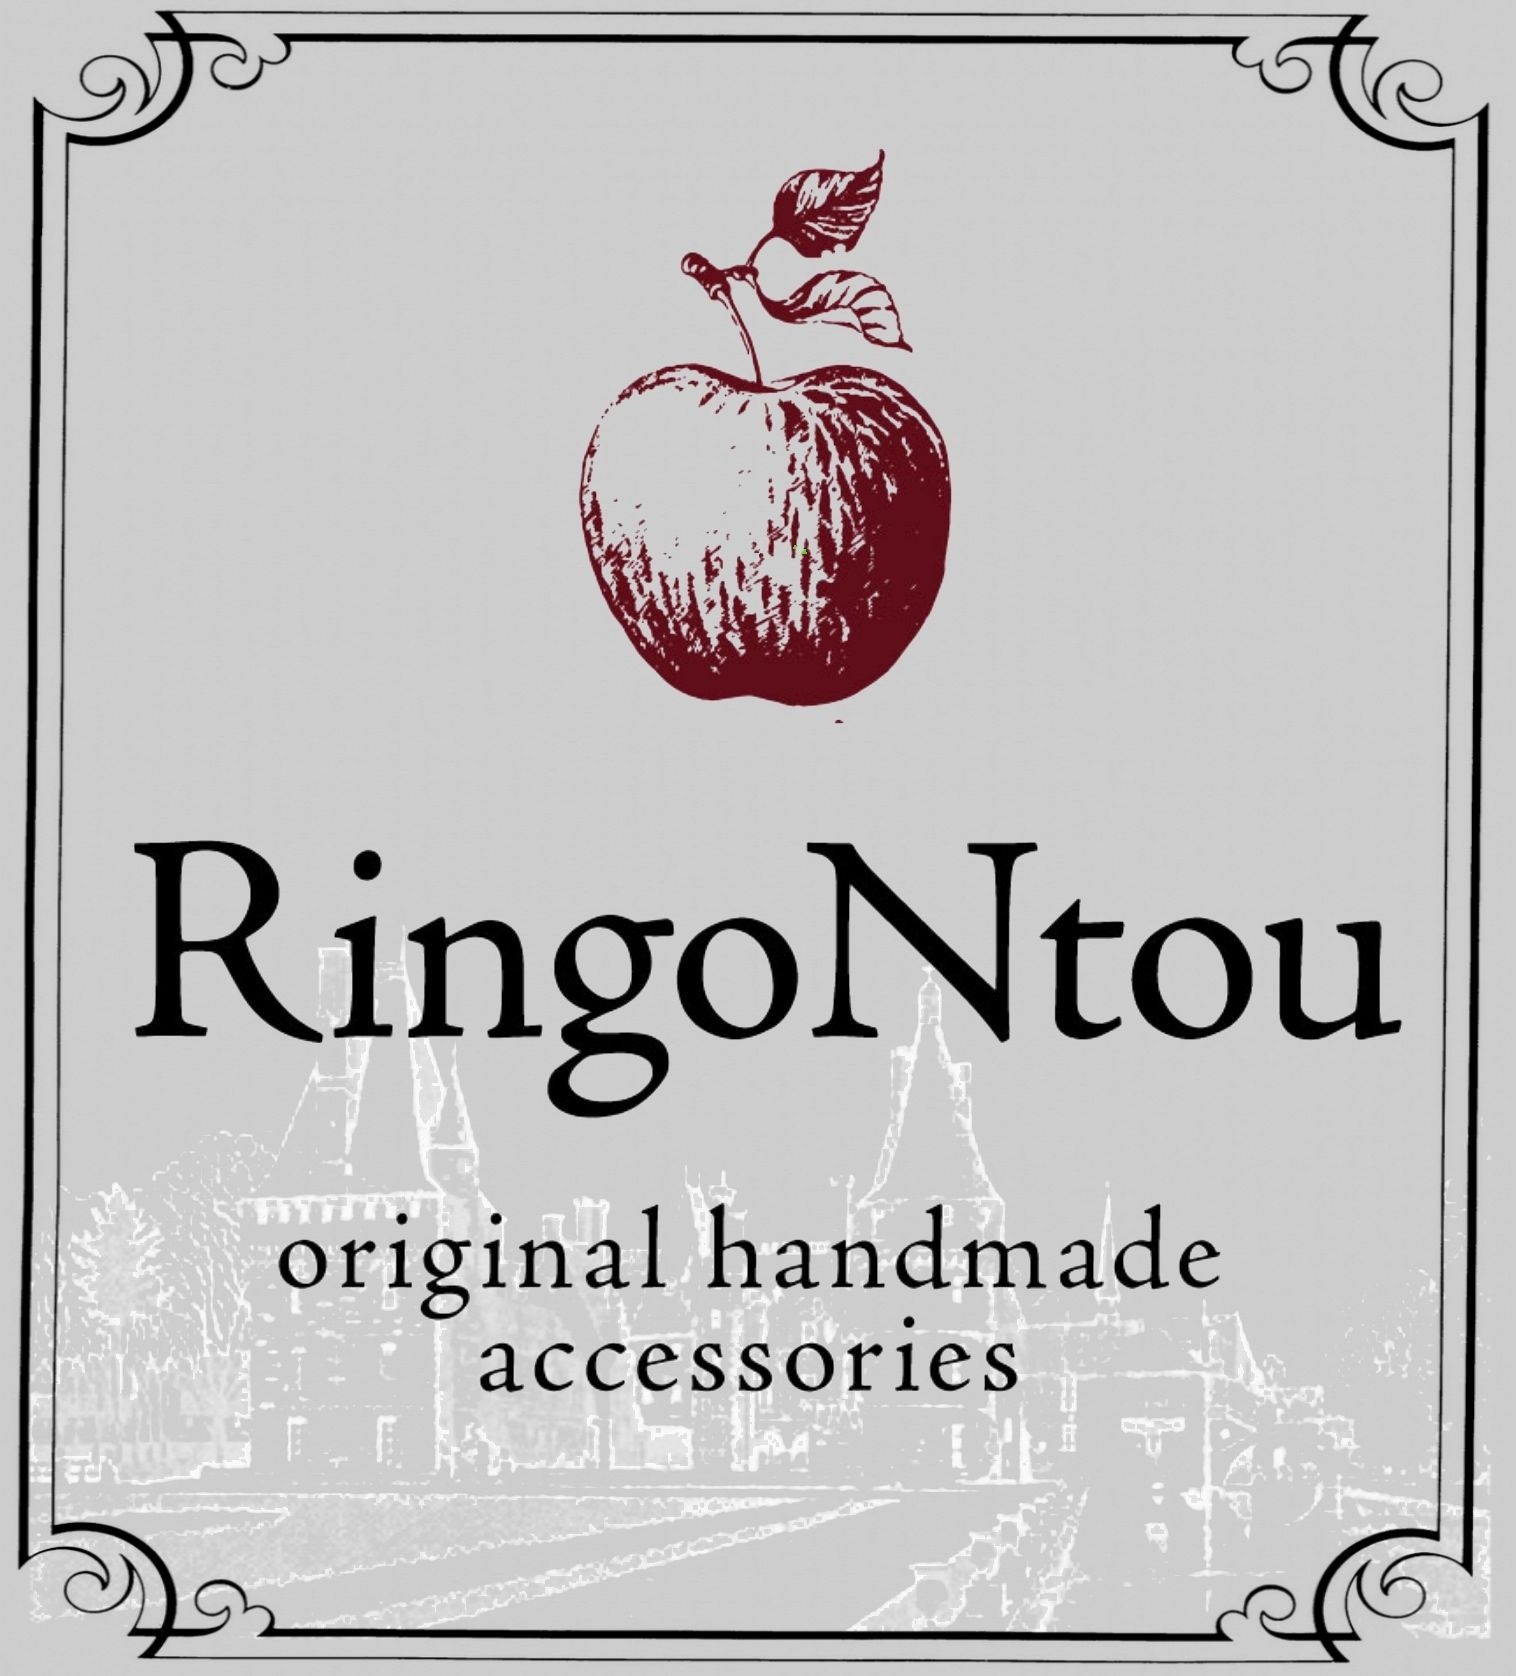 RingoNtou